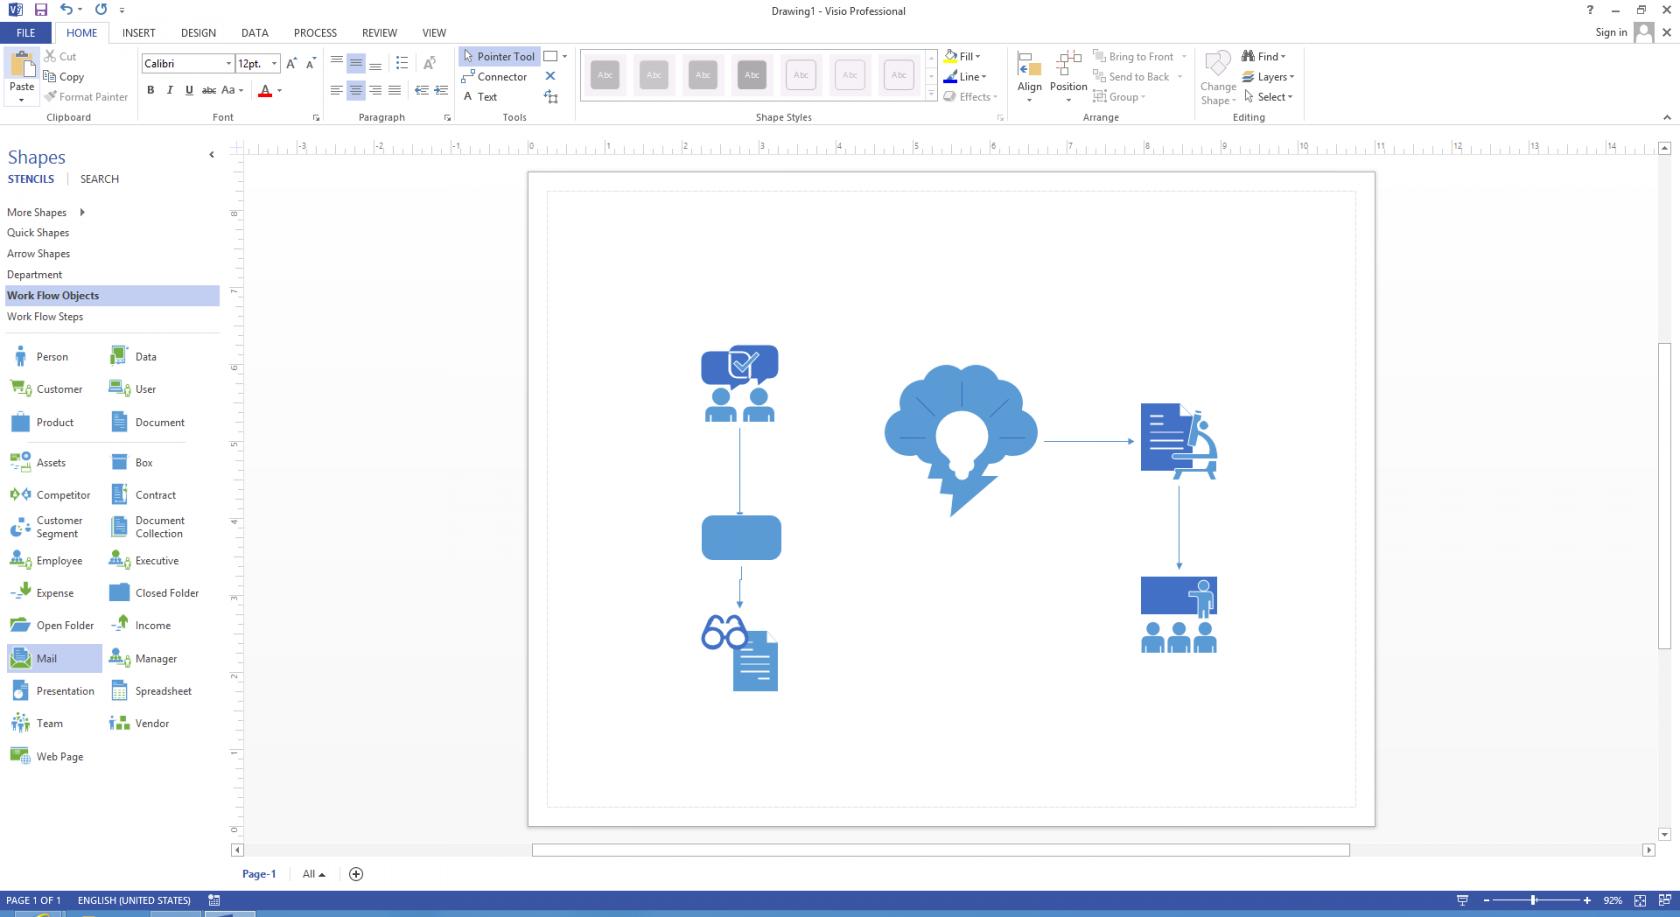 Microsoft visio professional 2013 discount